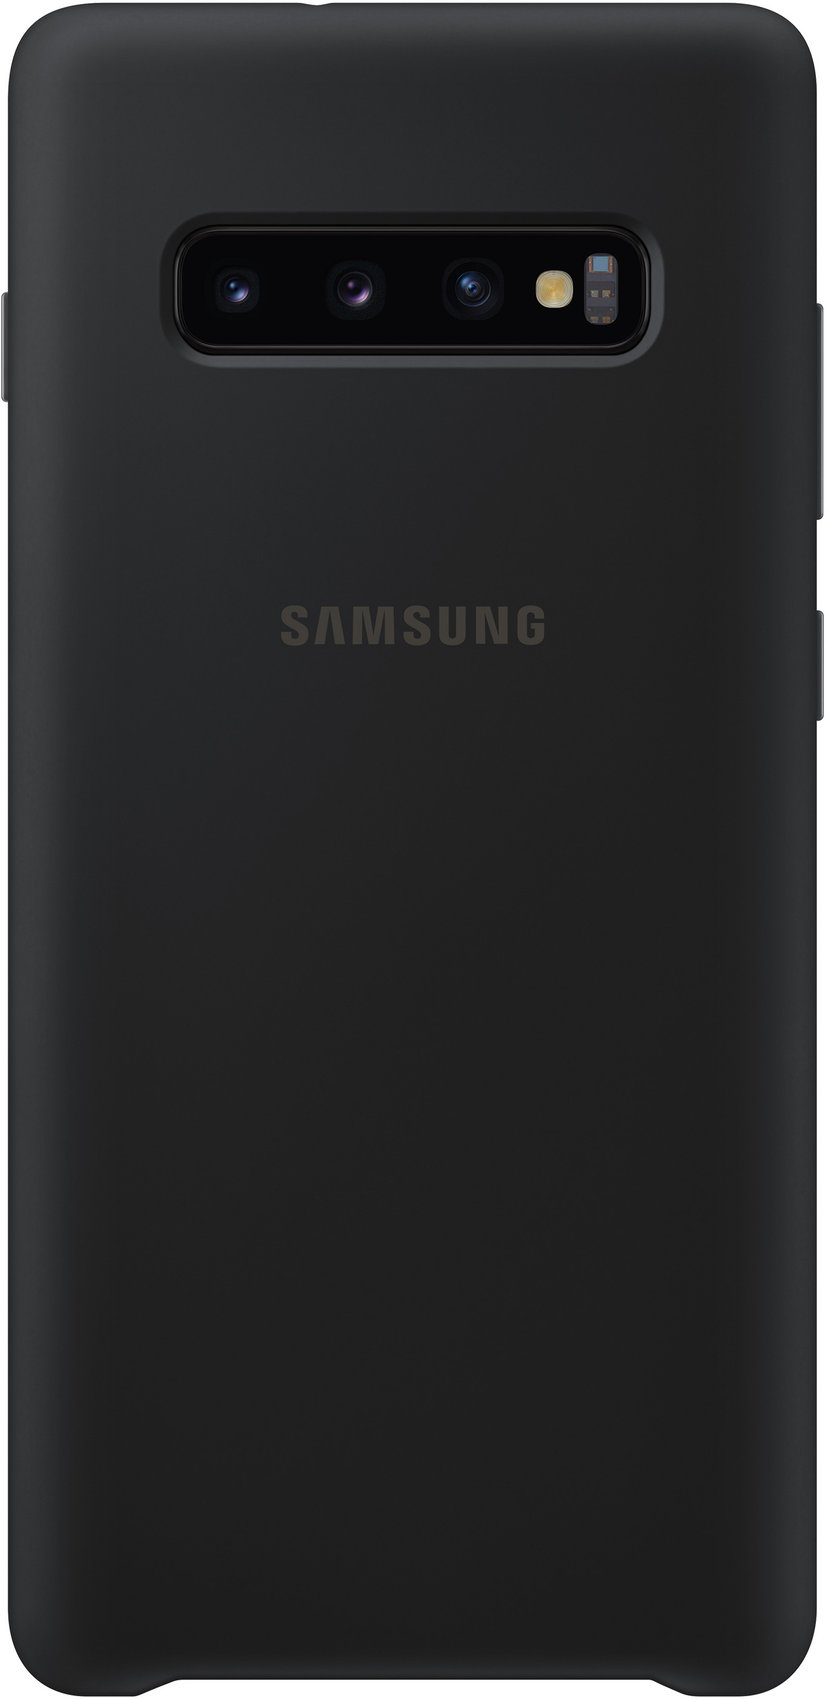 Samsung Silicone Cover EF-PG975 Samsung Galaxy S10+ Svart